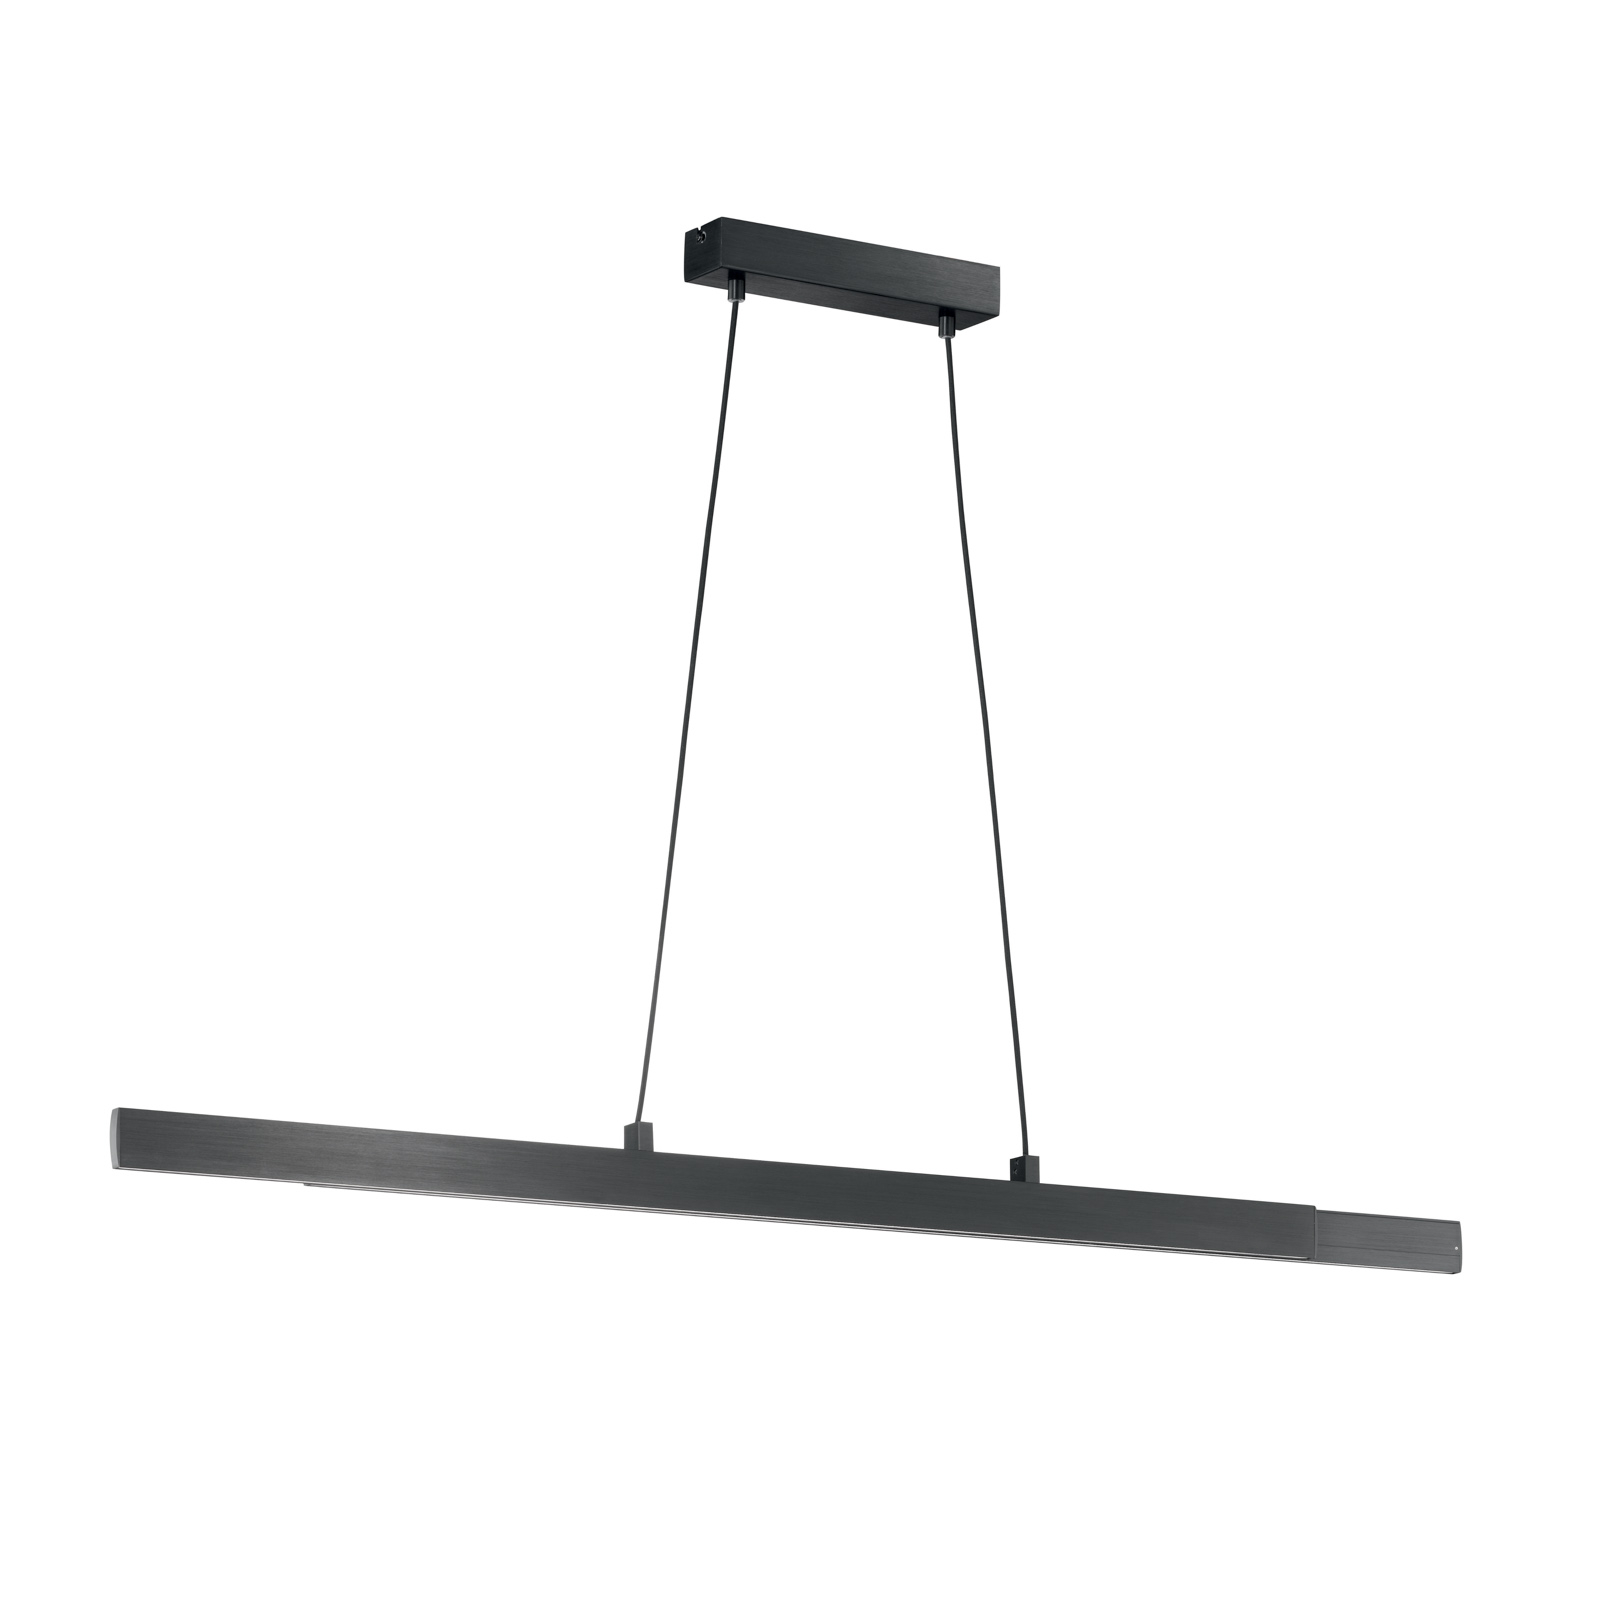 Schöner Wohnen Stripe suspension LED réglable